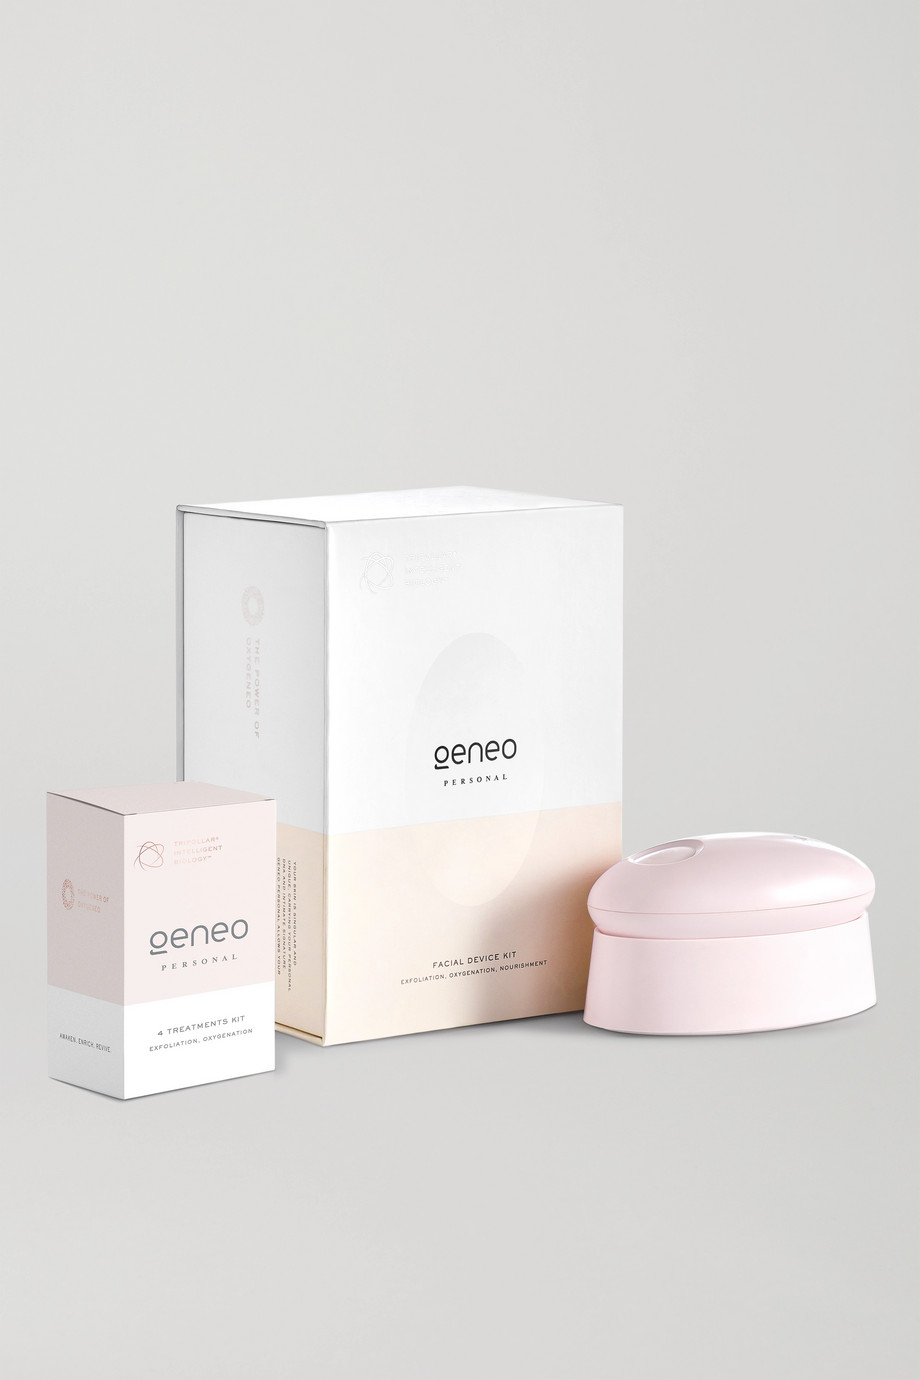 TriPollar Geneo Personal Facial Device Kit - Pink